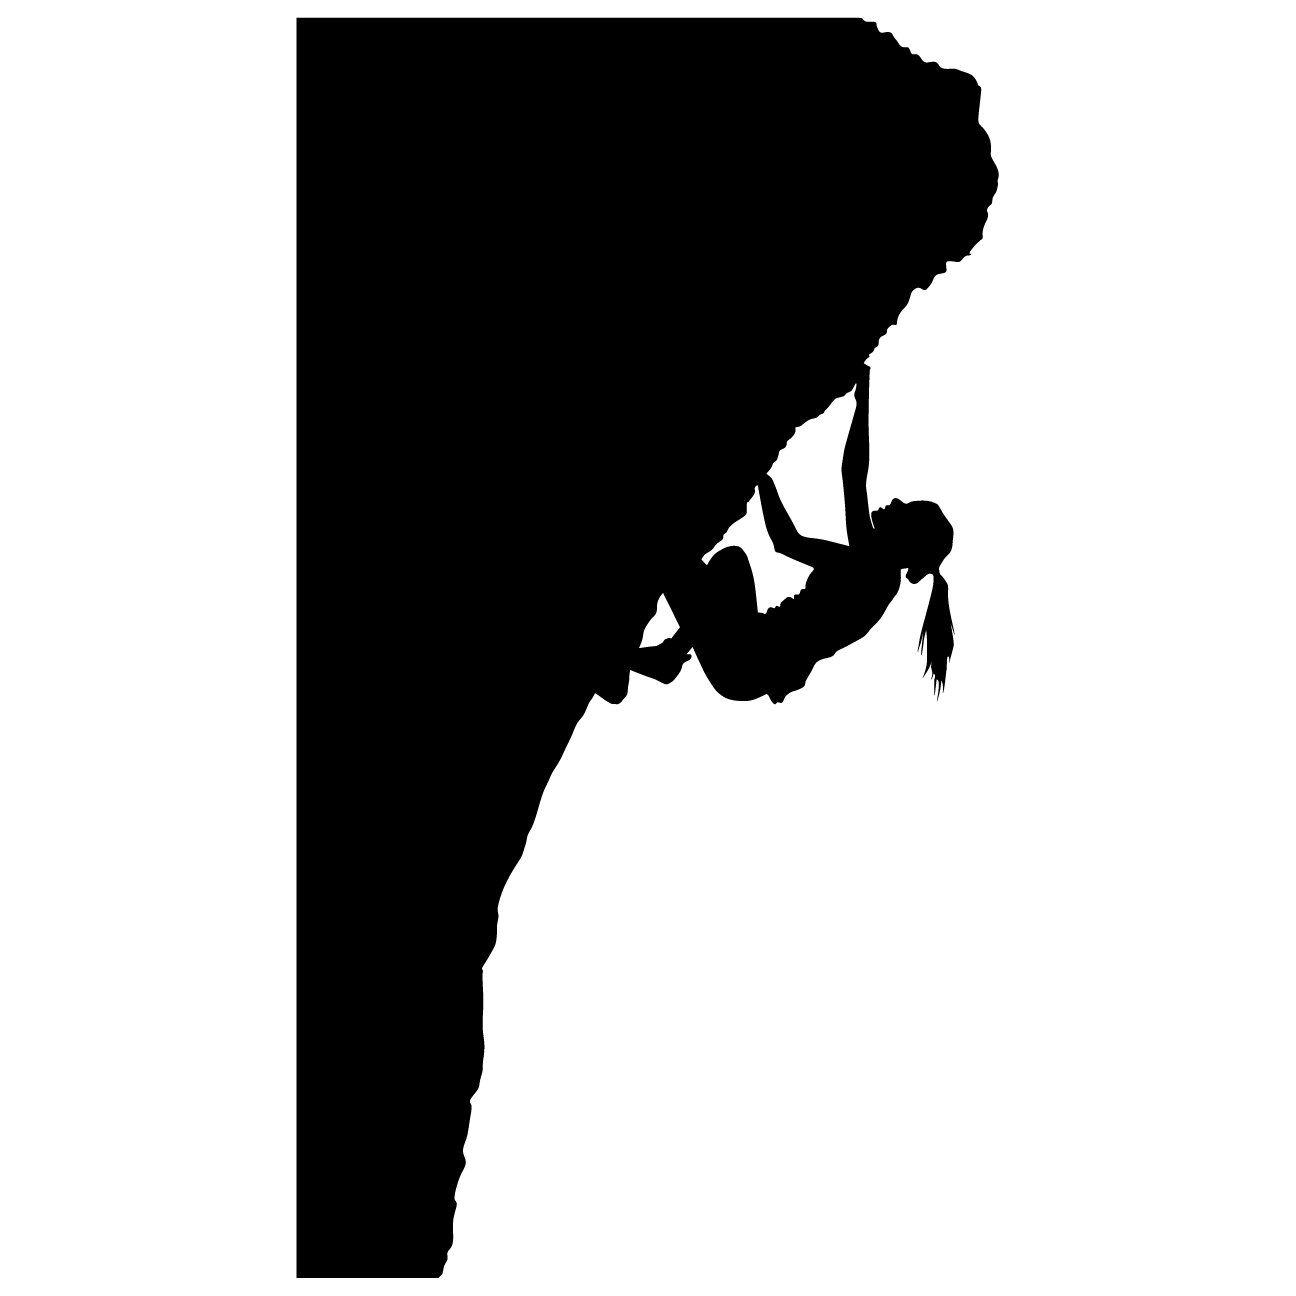 Amazon thevinylguru climbing wall sticker decal 12 amazon thevinylguru climbing wall sticker decal 12 sports silhouette decoration mural amipublicfo Choice Image